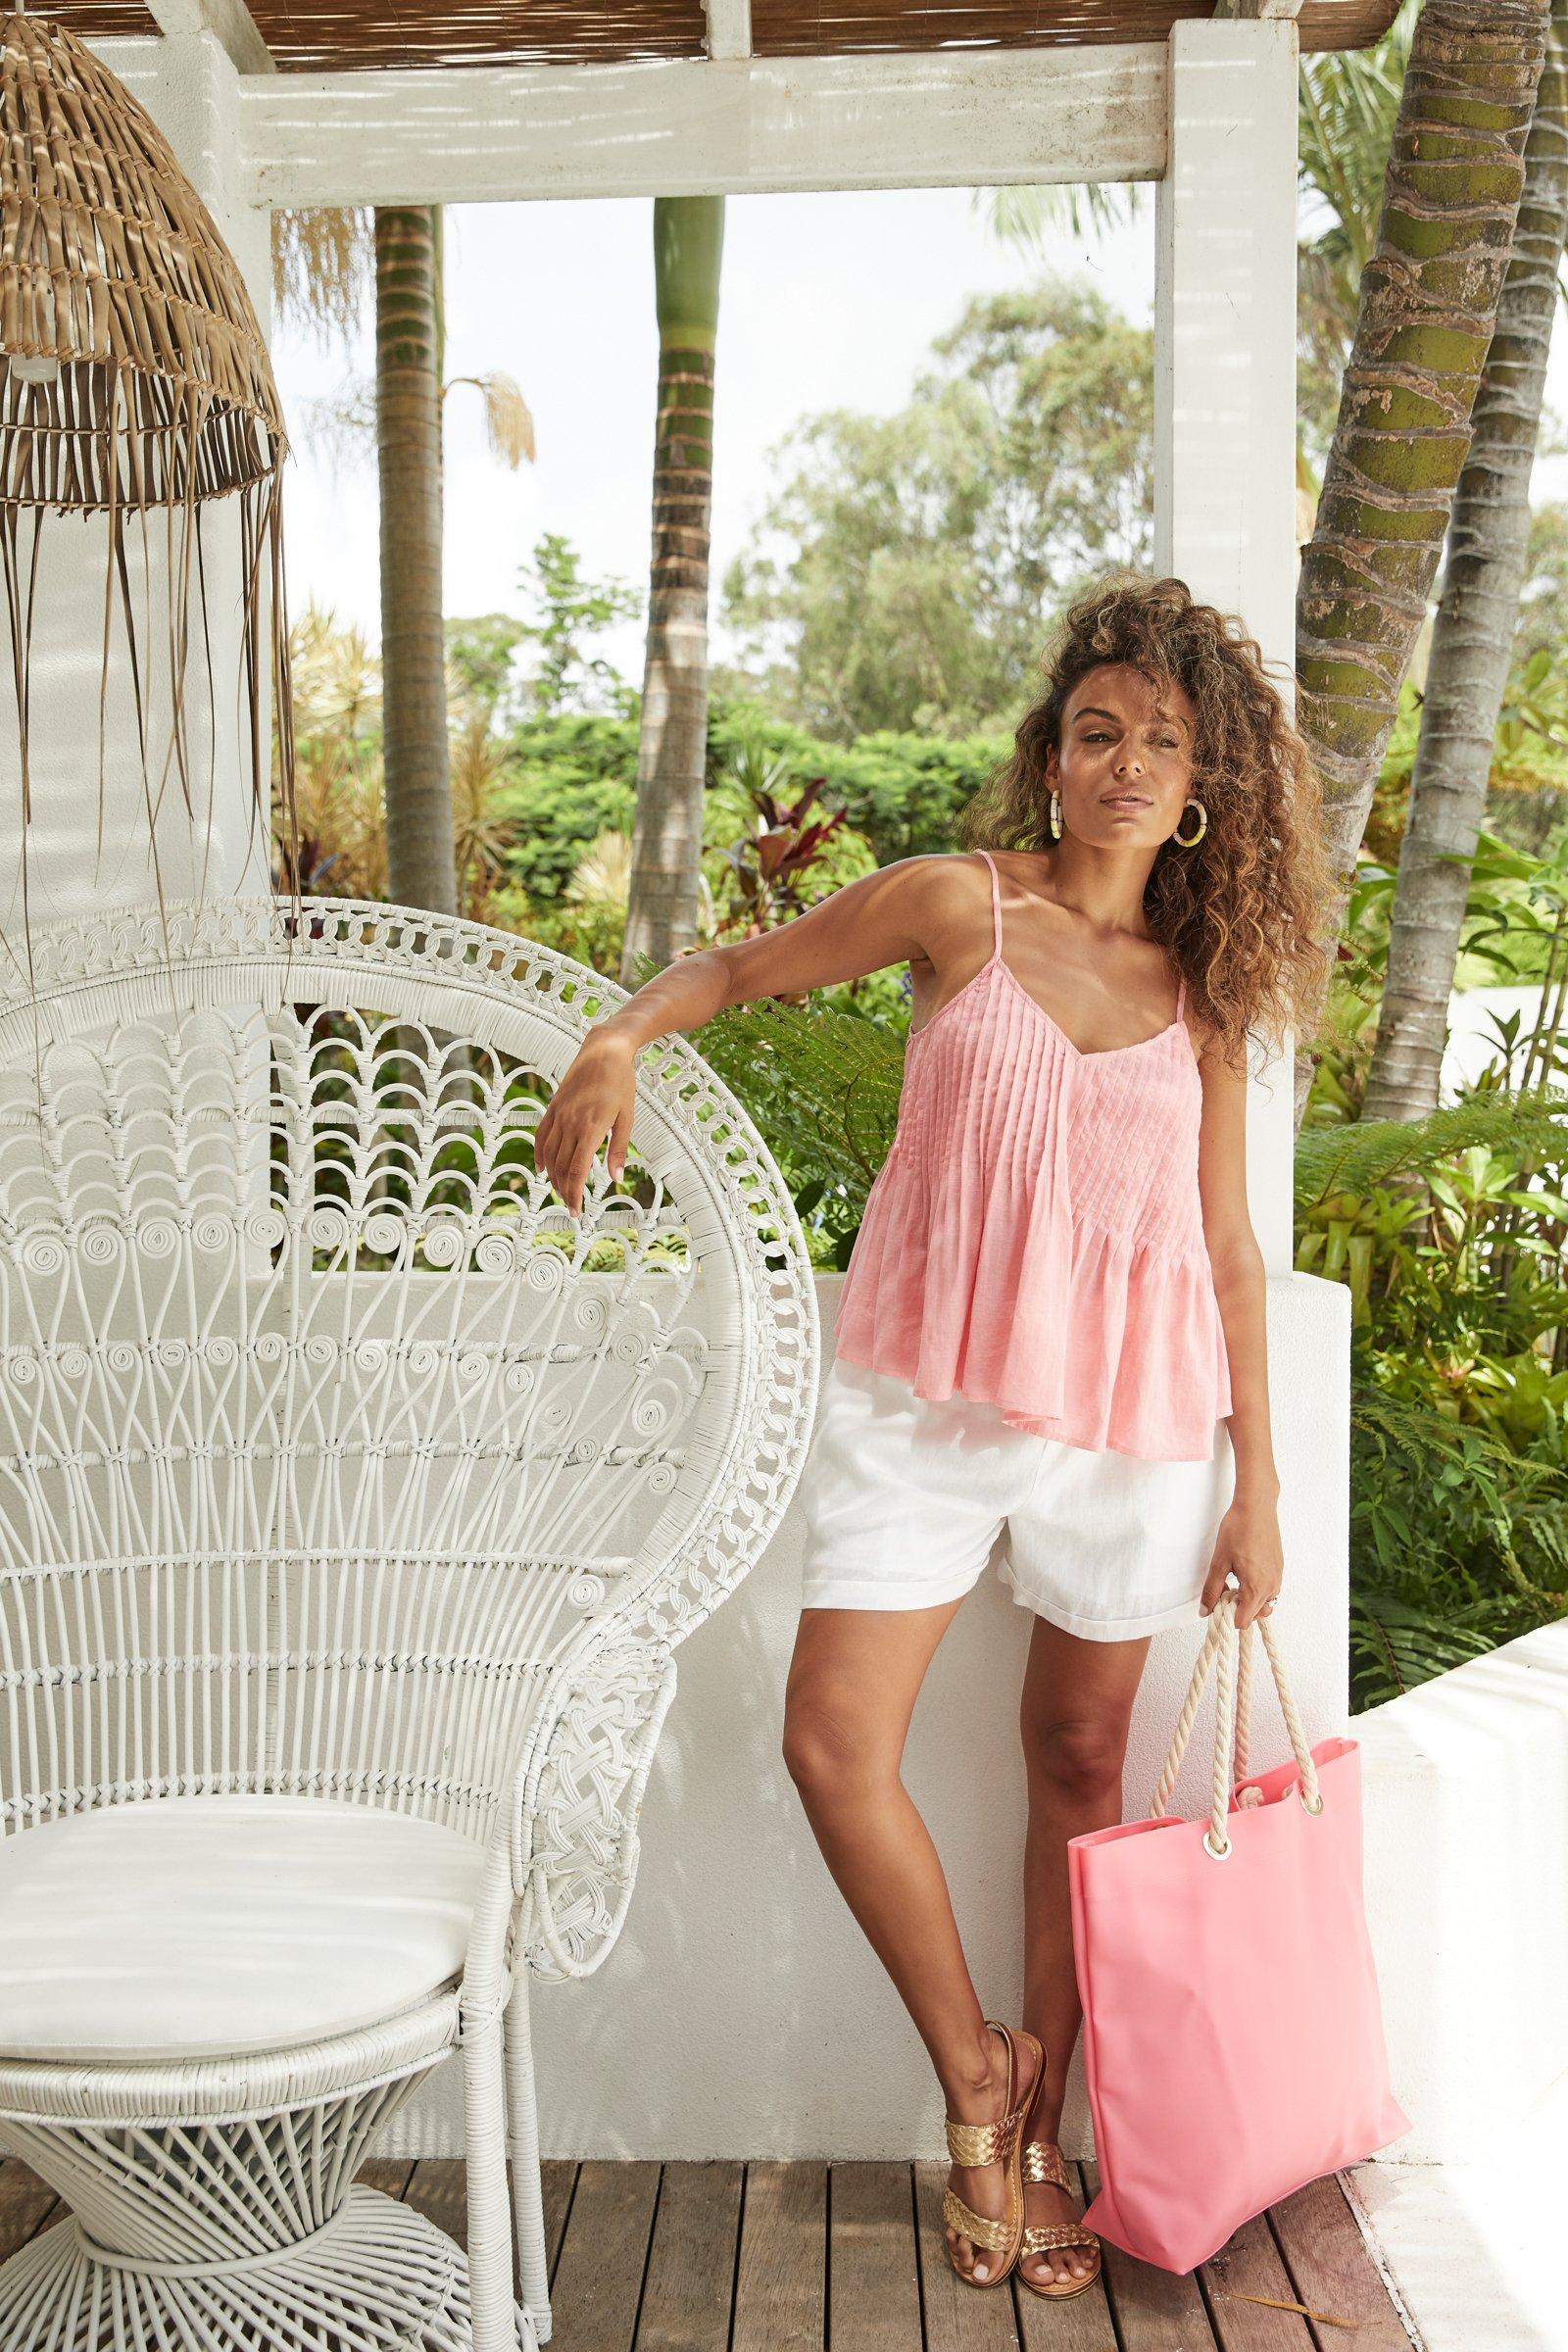 Haven Majorca Shorts - White